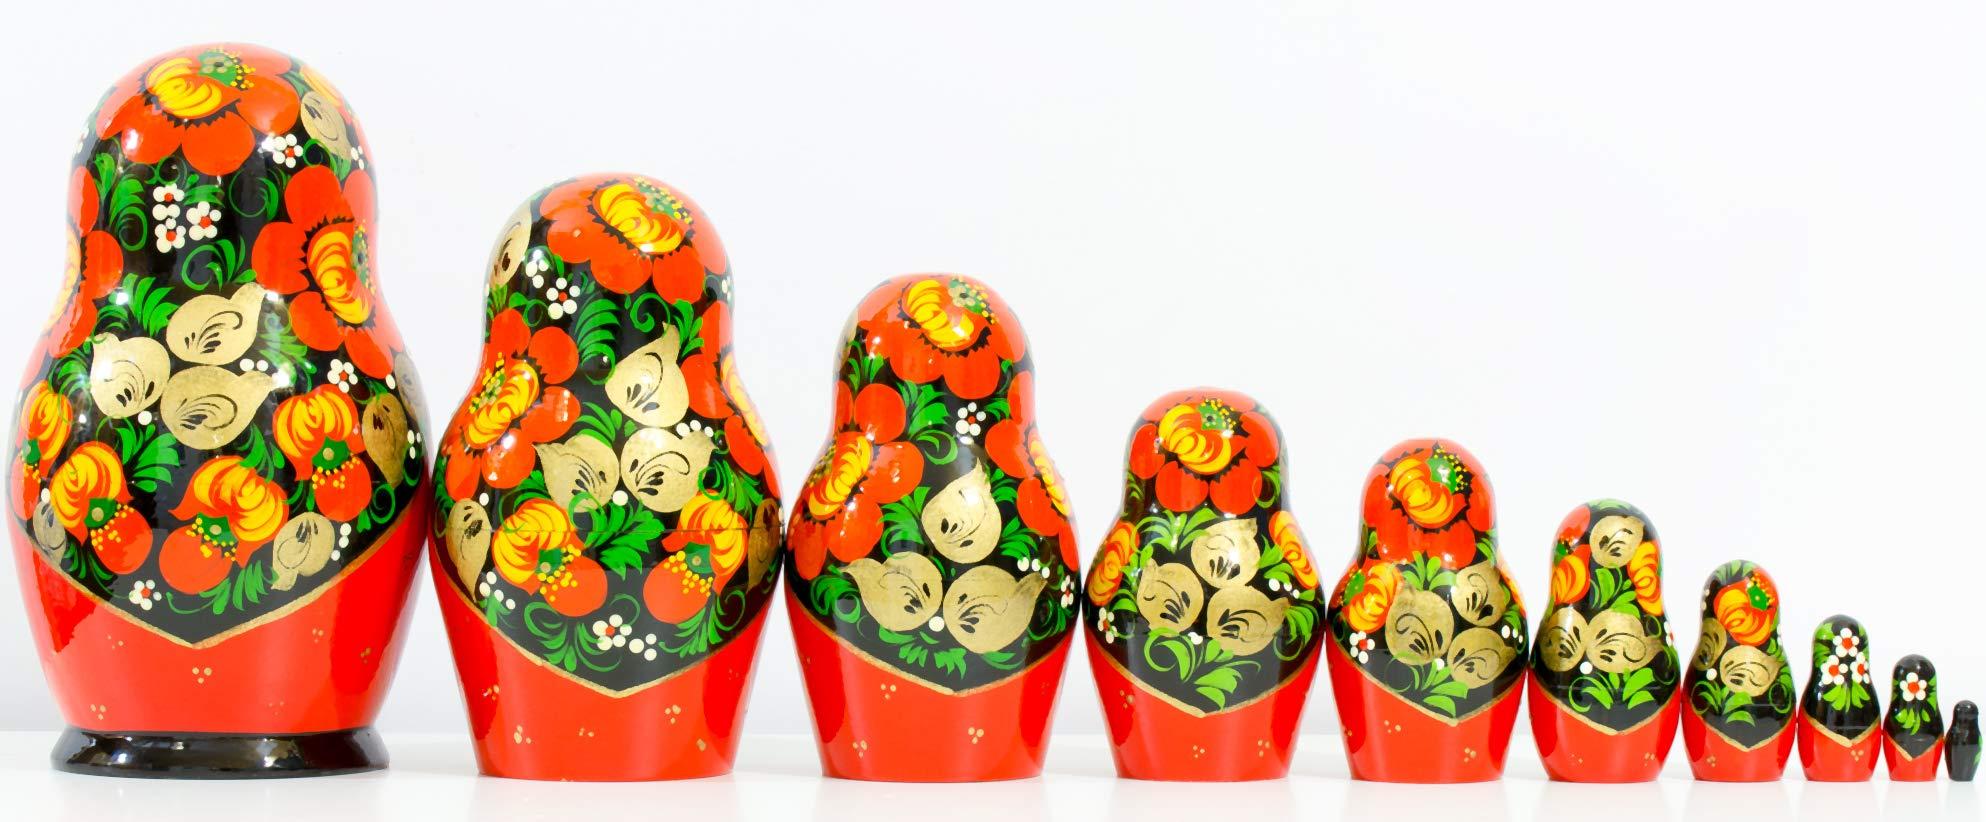 Russian Nesting Doll - Kirov - VJATKA - Hand Painted in Russia - Big Size - Wooden Decoration Gift Doll - Matryoshka Babushka (Style C, 8.25``(10 Dolls in 1)) by craftsfromrussia (Image #5)